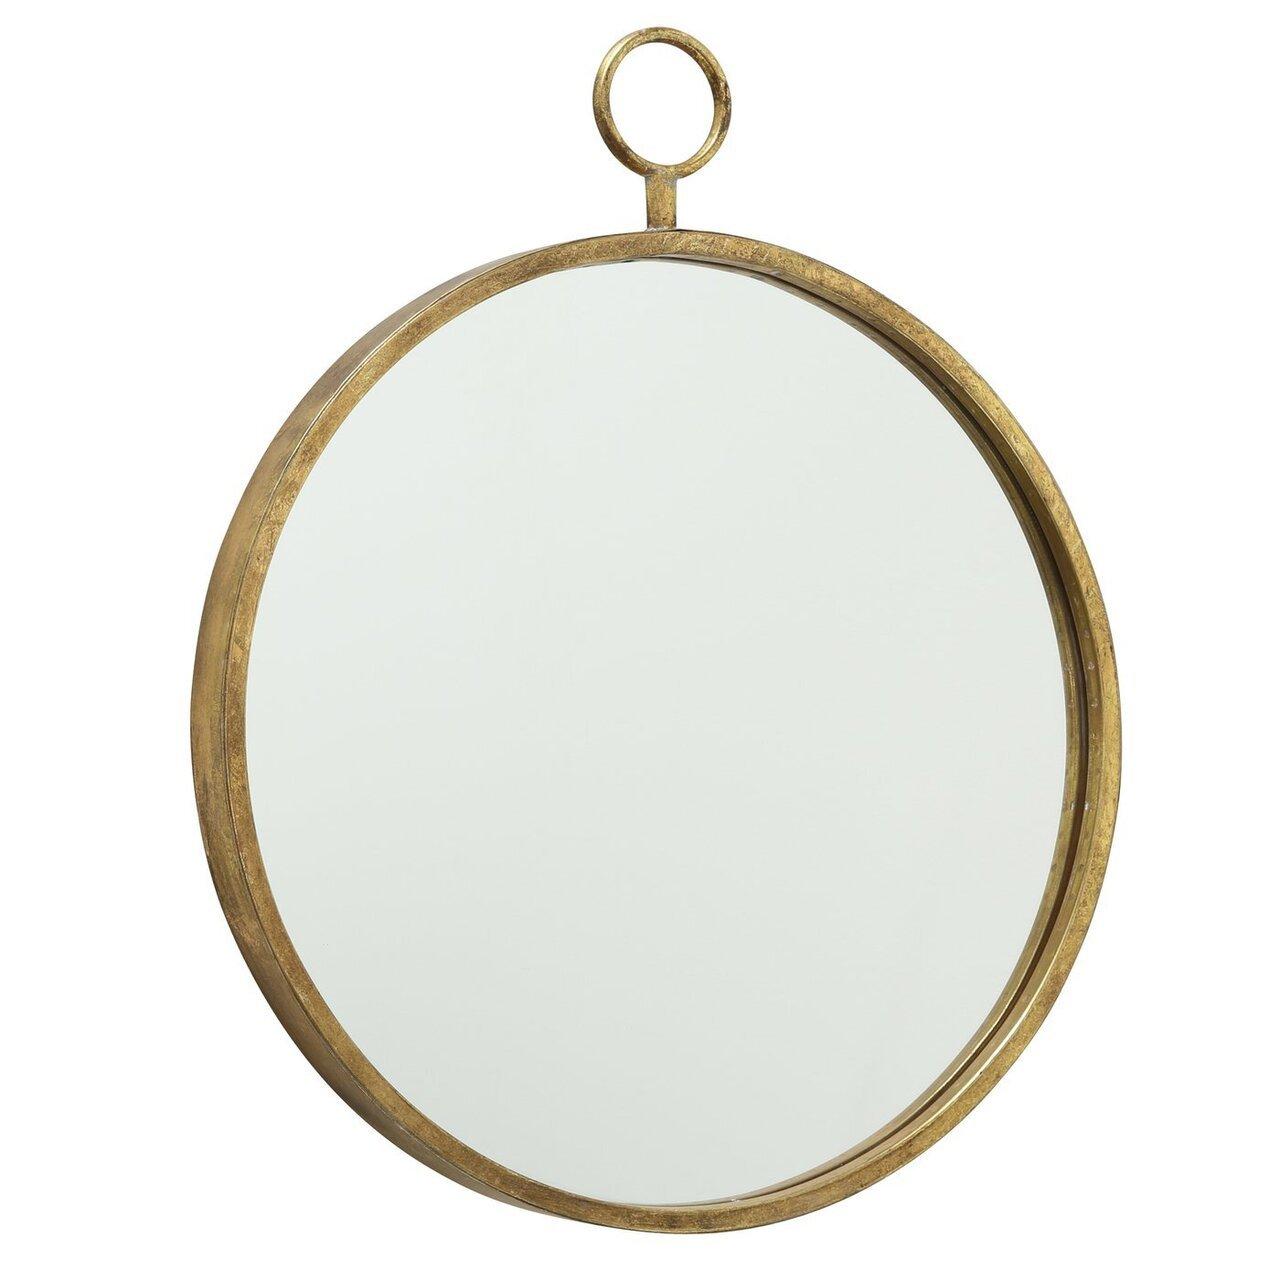 Boltze Spiegel Wandspiegel Prado